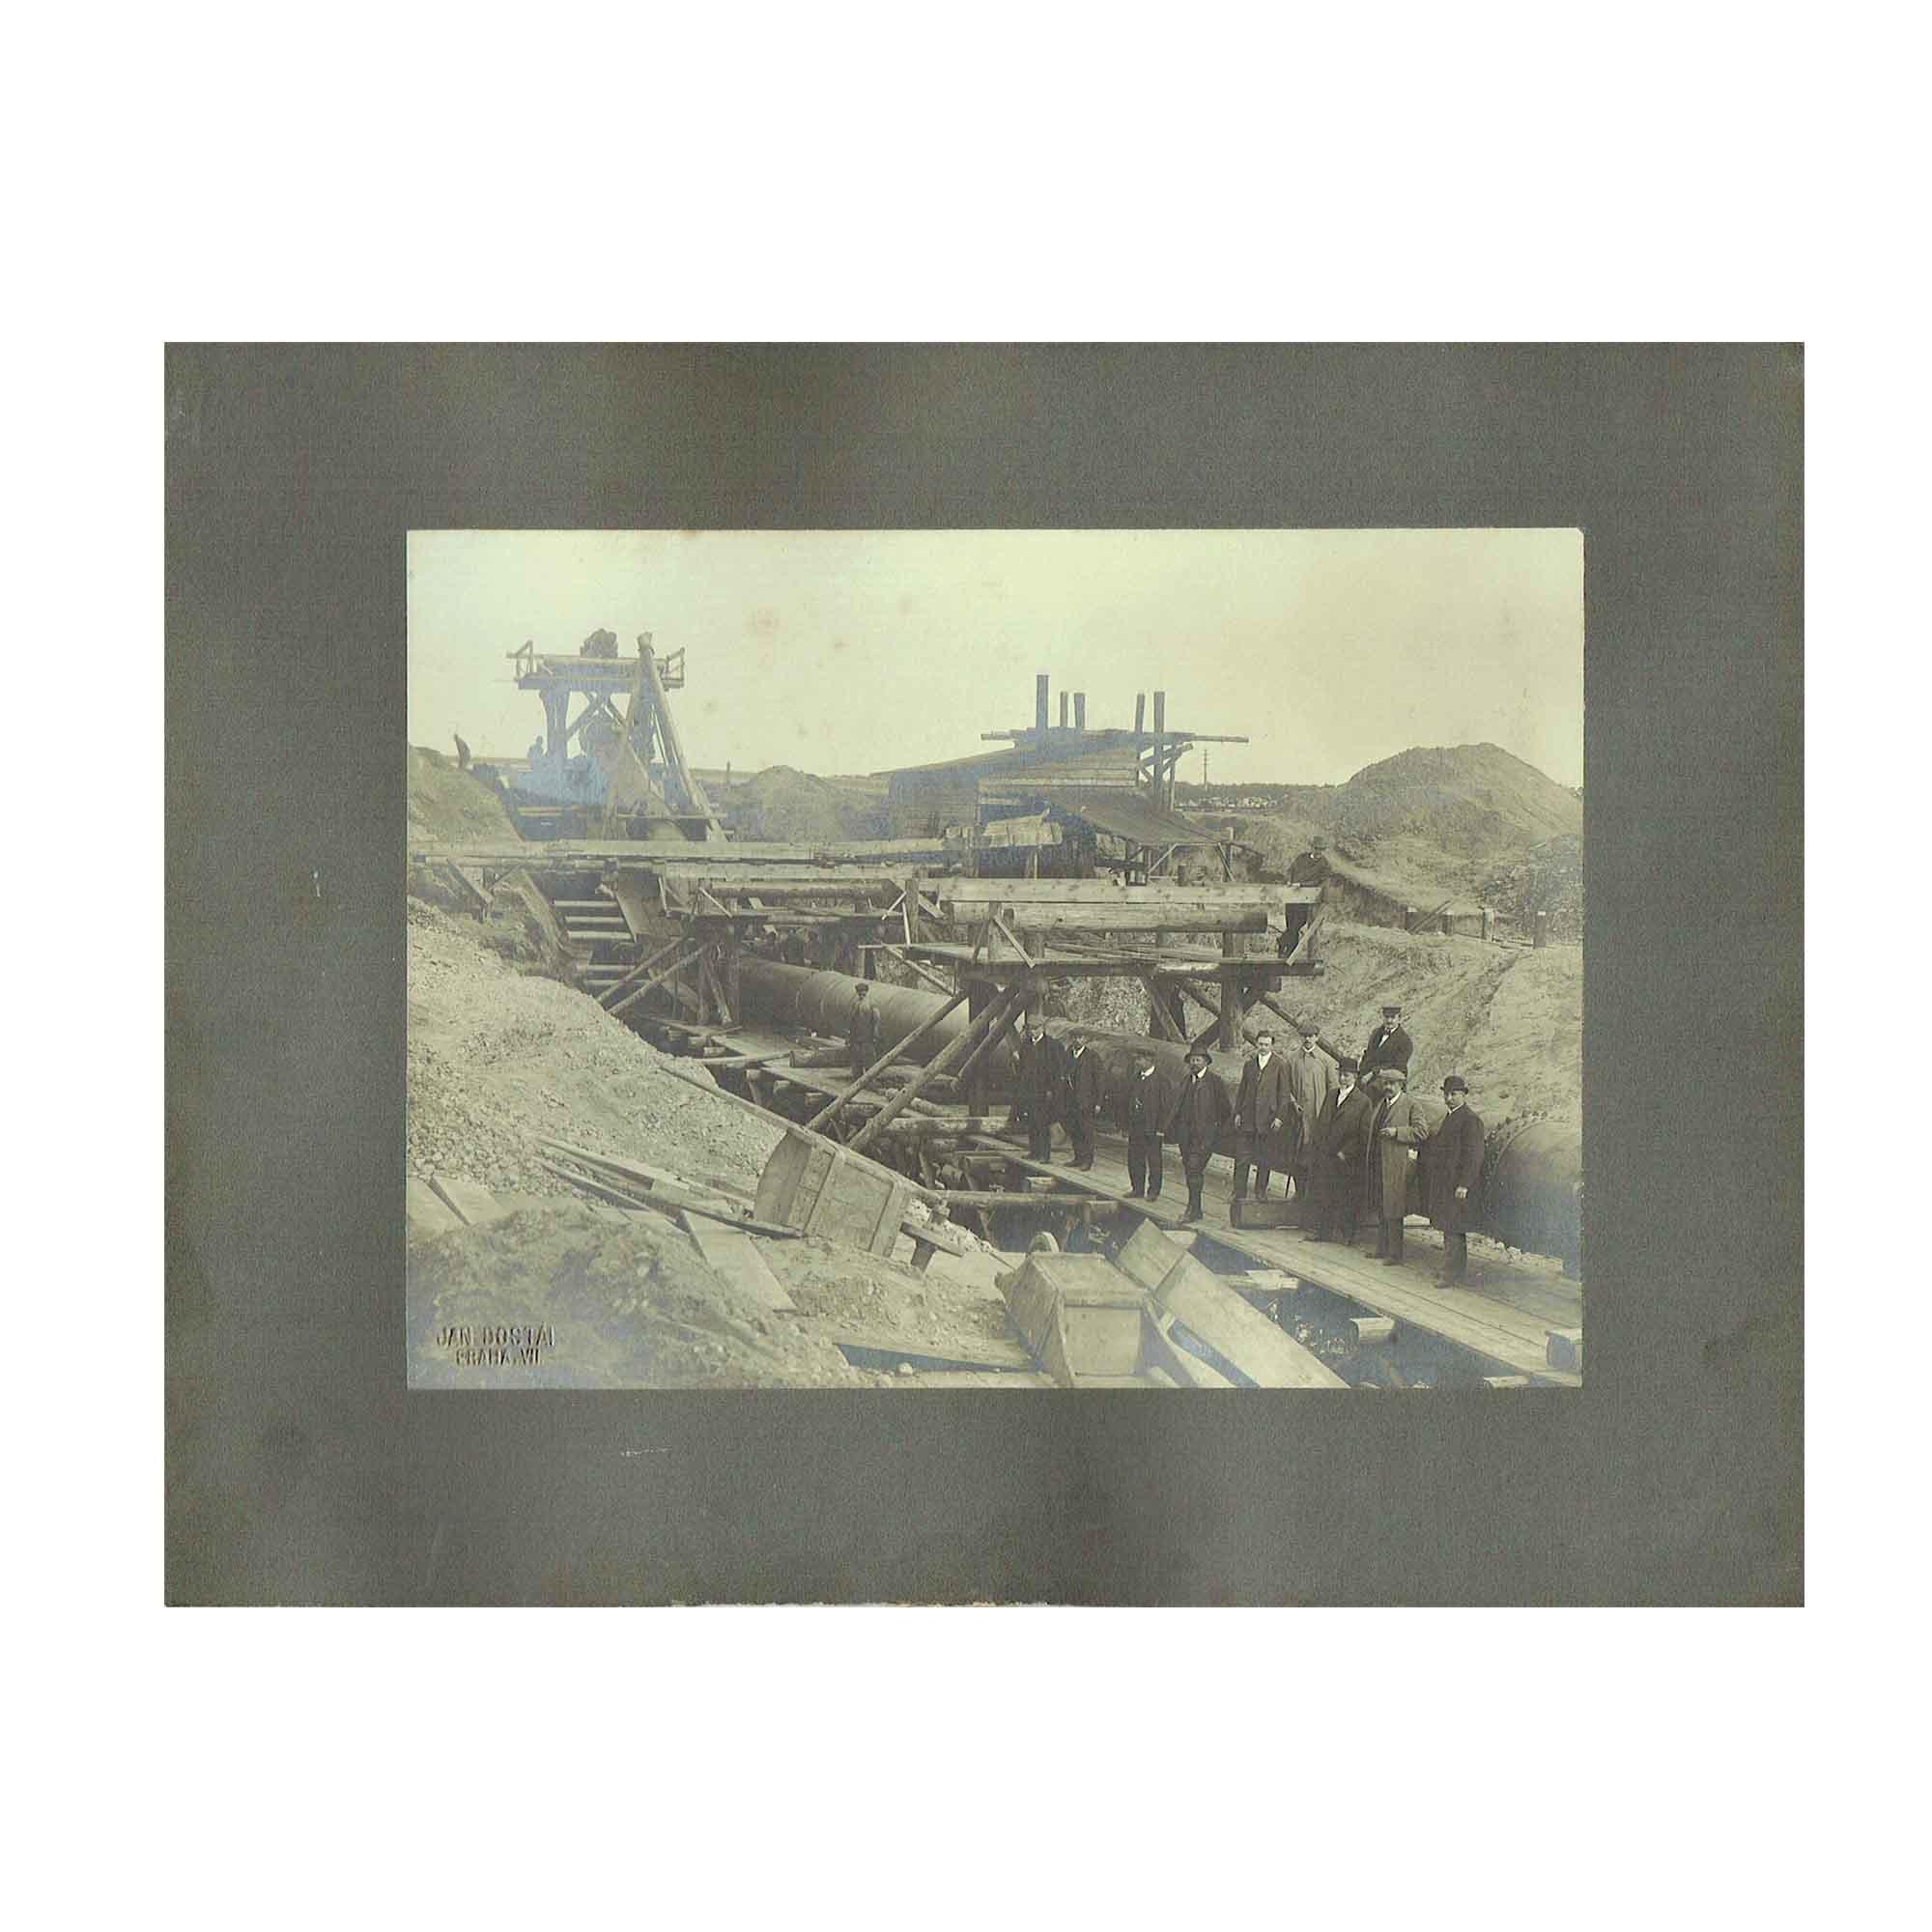 5351 Foto Dostál Rohrleitung Baustelle 1890 N